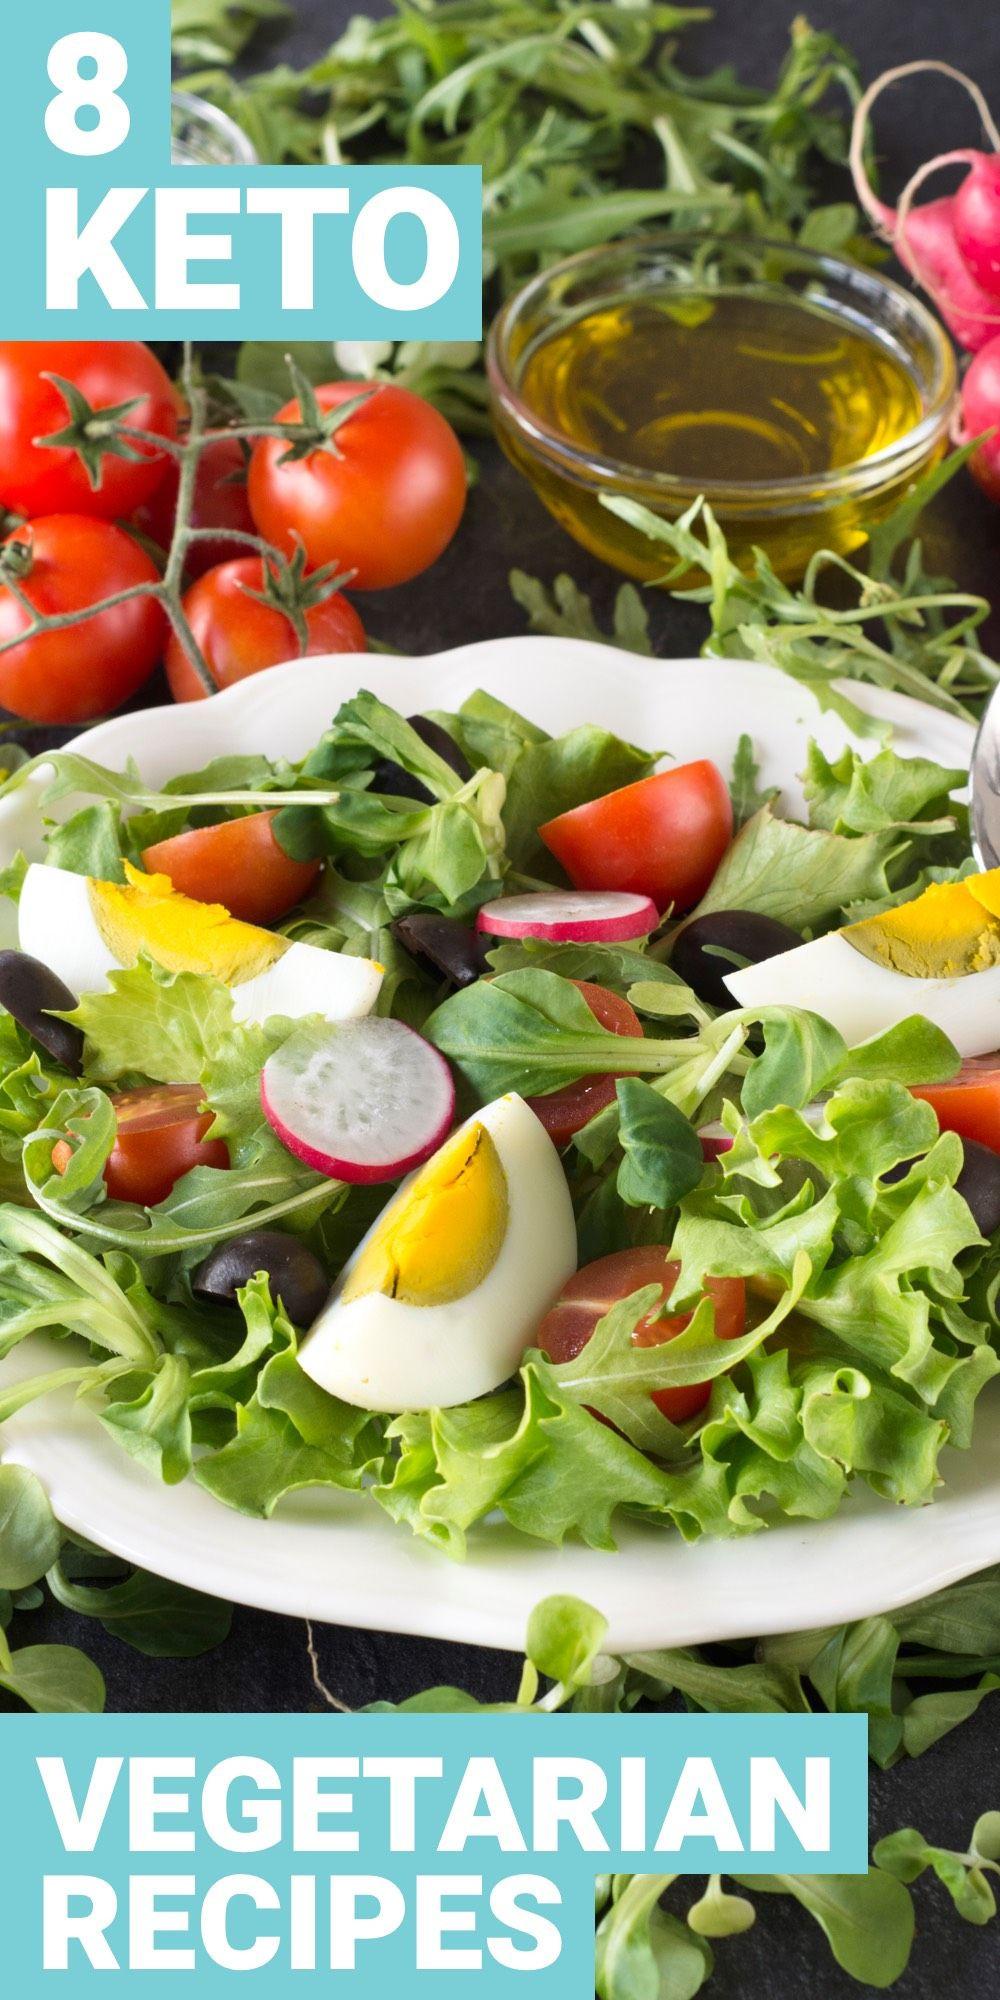 Vegetarian Keto Plan Easy Ve arian Keto Recipes 8 Keto Recipes Perfect for